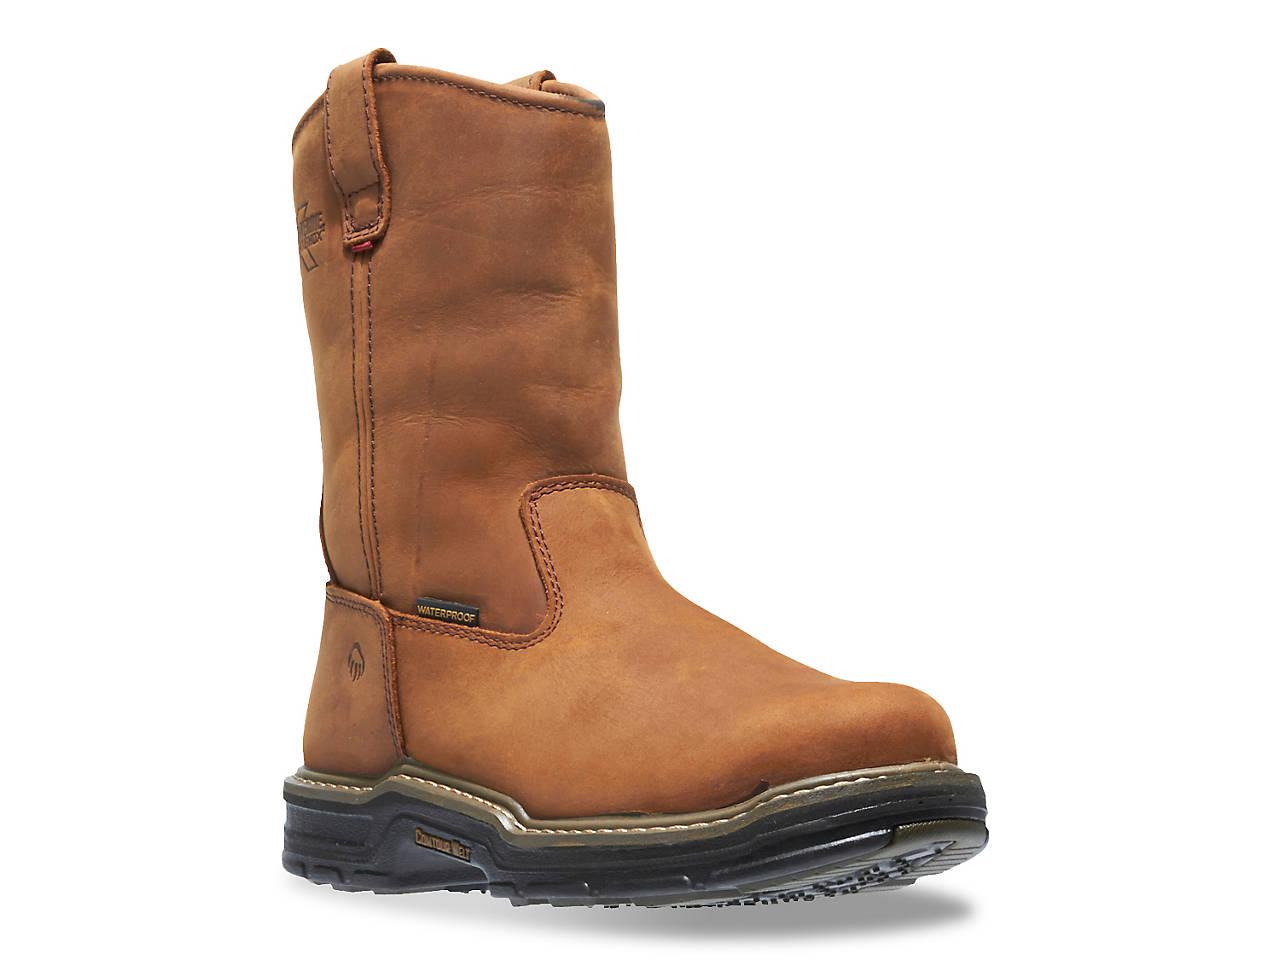 a2c1b8394e3 Marauder Wellington Steel Toe Work Boot